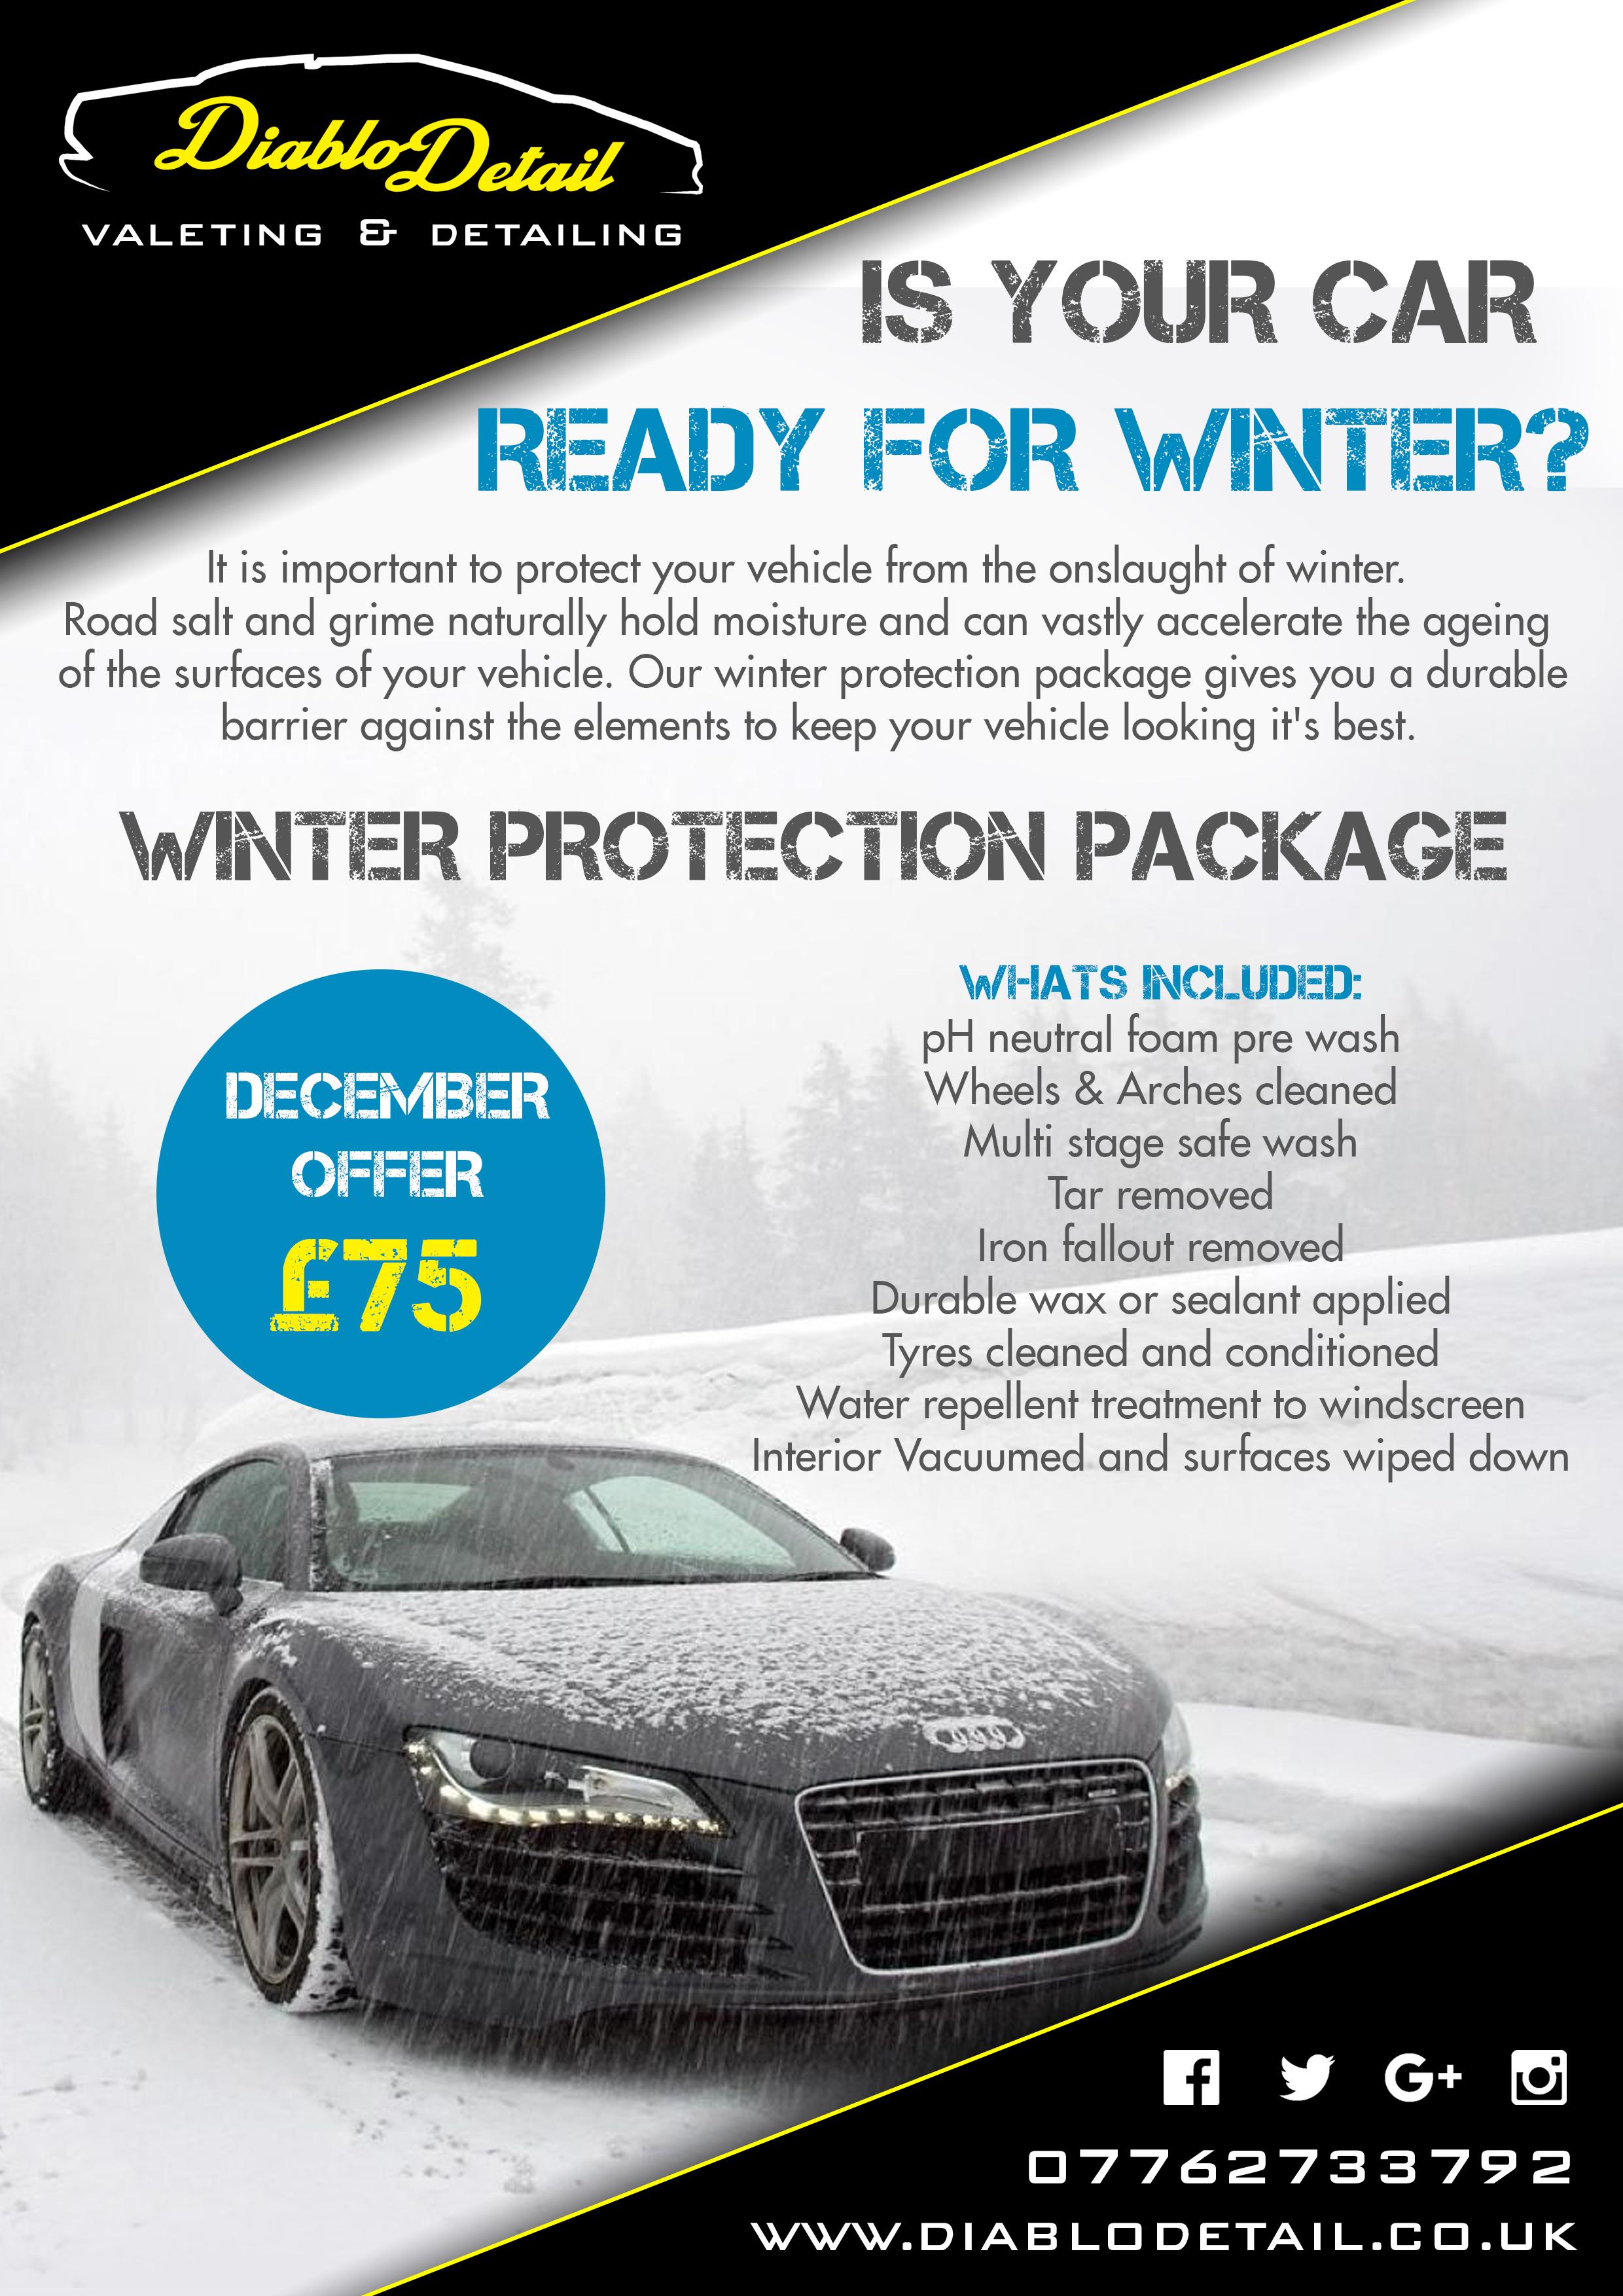 Winter Protection Package Diablo Detail Valeting Detailing